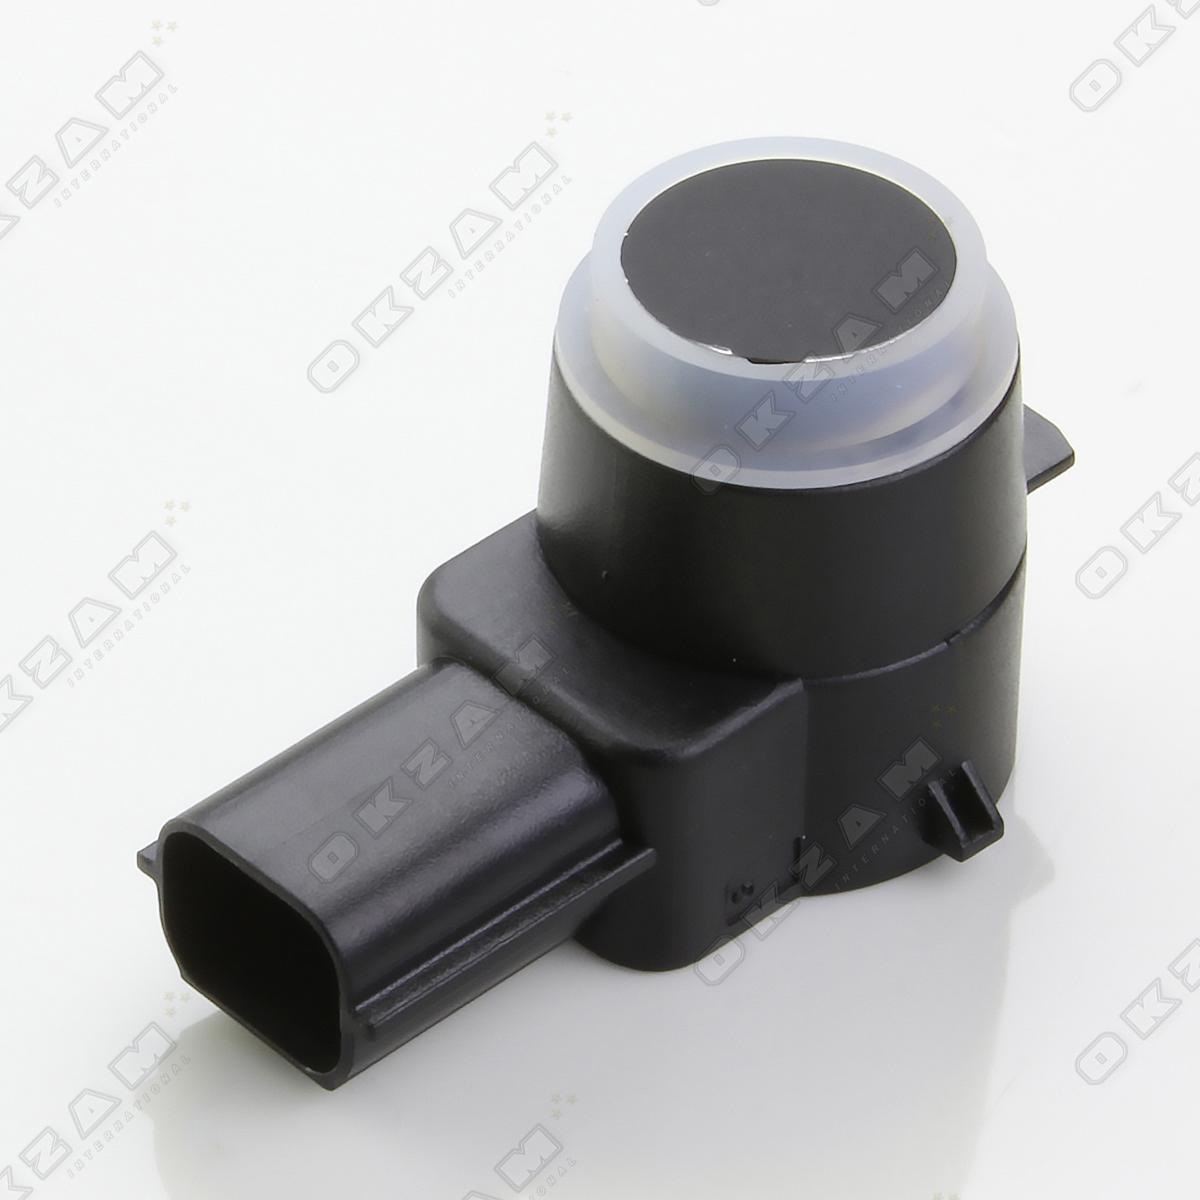 pdc sensor einparkhilfe vorne hinten f r opel zafira b zafira c 1235281 neu ebay. Black Bedroom Furniture Sets. Home Design Ideas